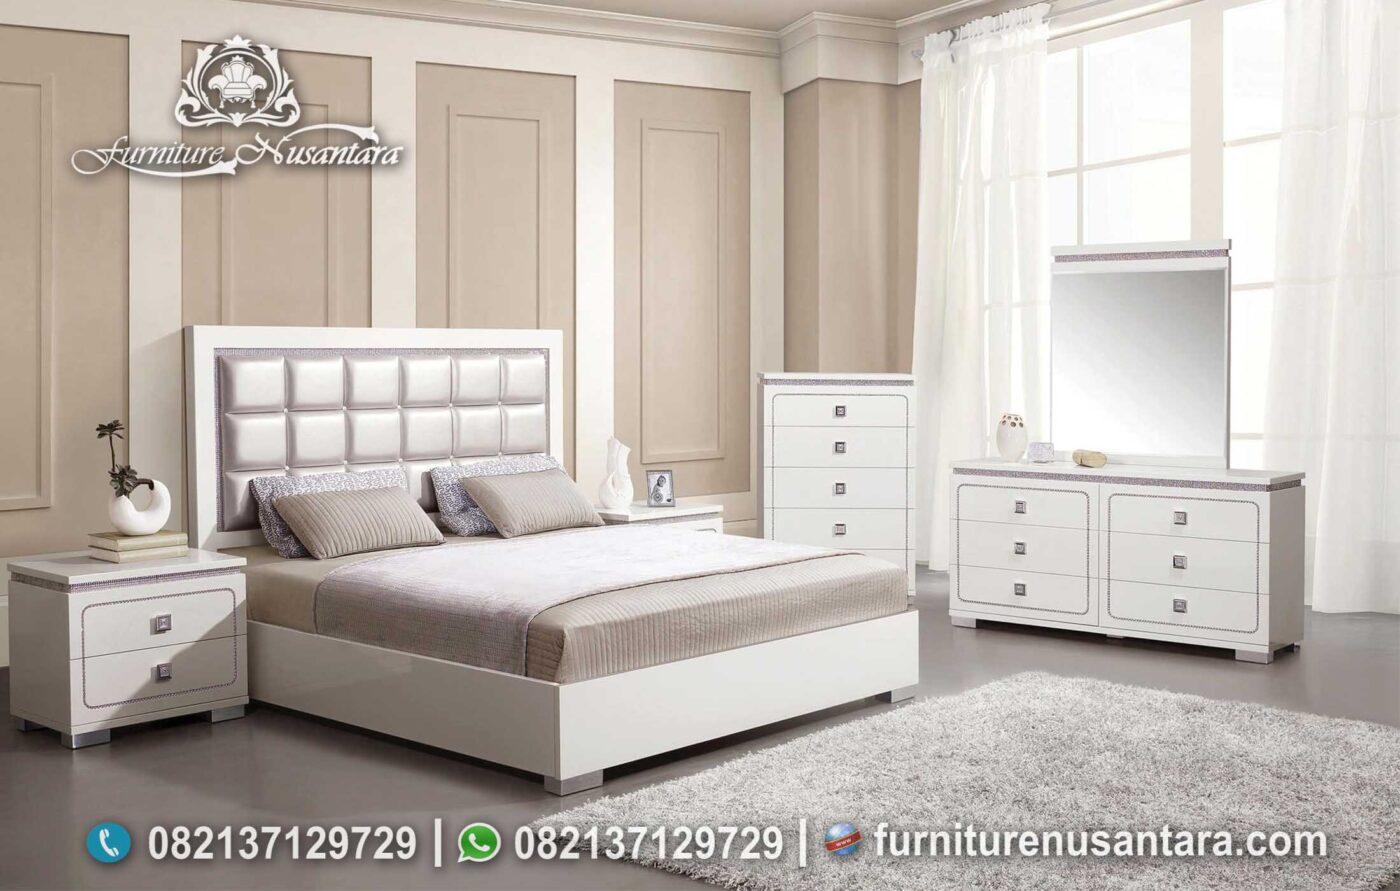 Desain Tempat Tidur Minimalis Stylist KS-166, Furniture Nusantara